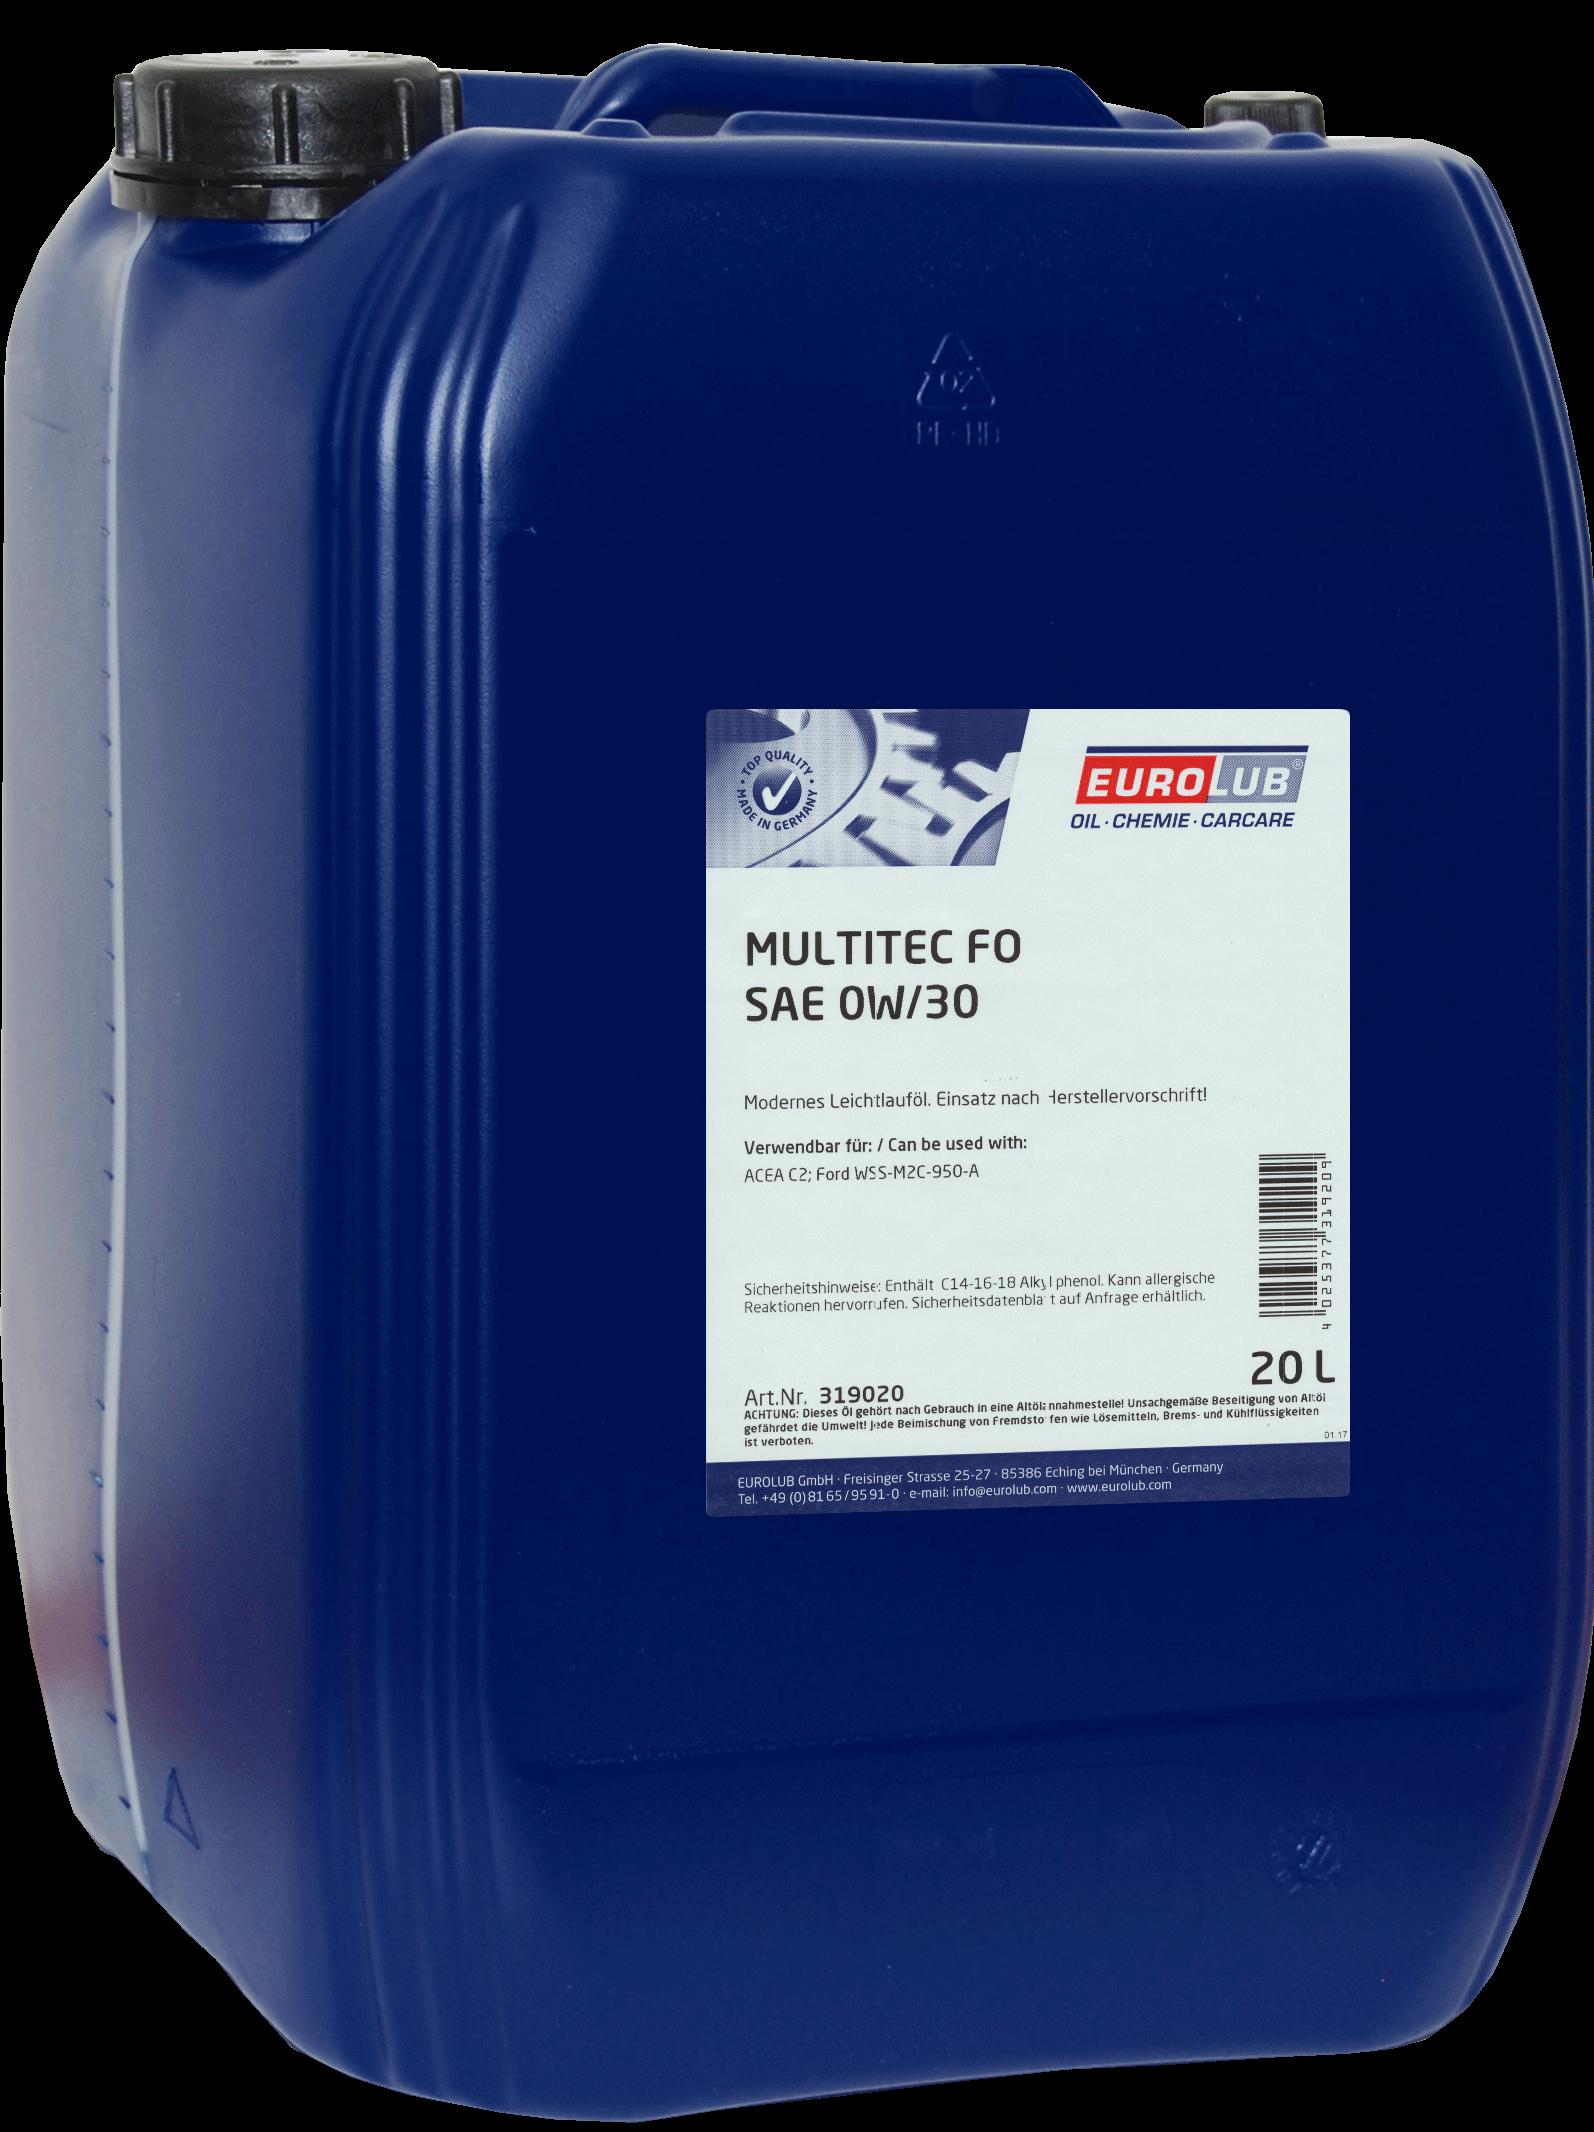 EUROLUB ECO MULTITEC FO SAE 0W/30 (синтетическое, Mid SAPS), 20л